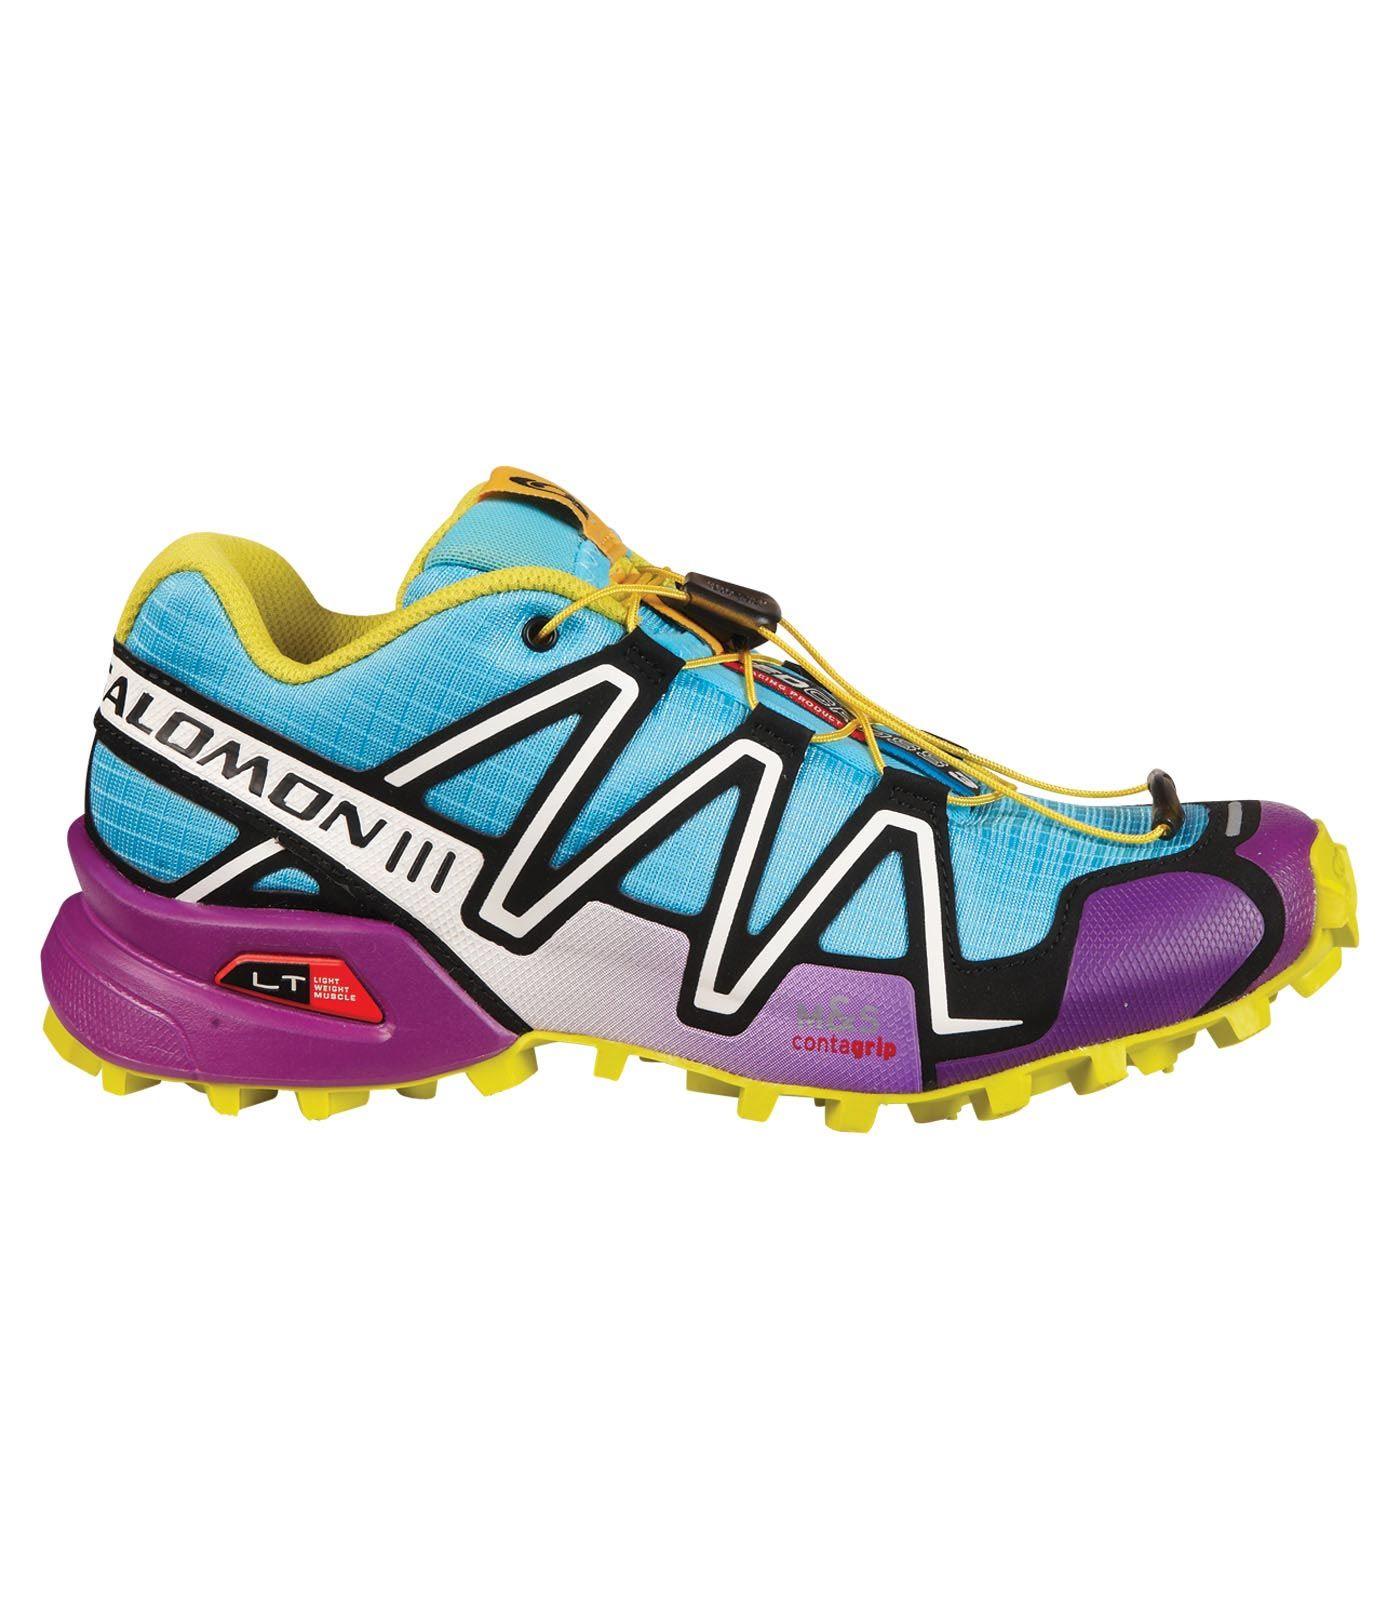 ad77272012e5 Salomon - Speedcross 3... Best trail running shoe ever!